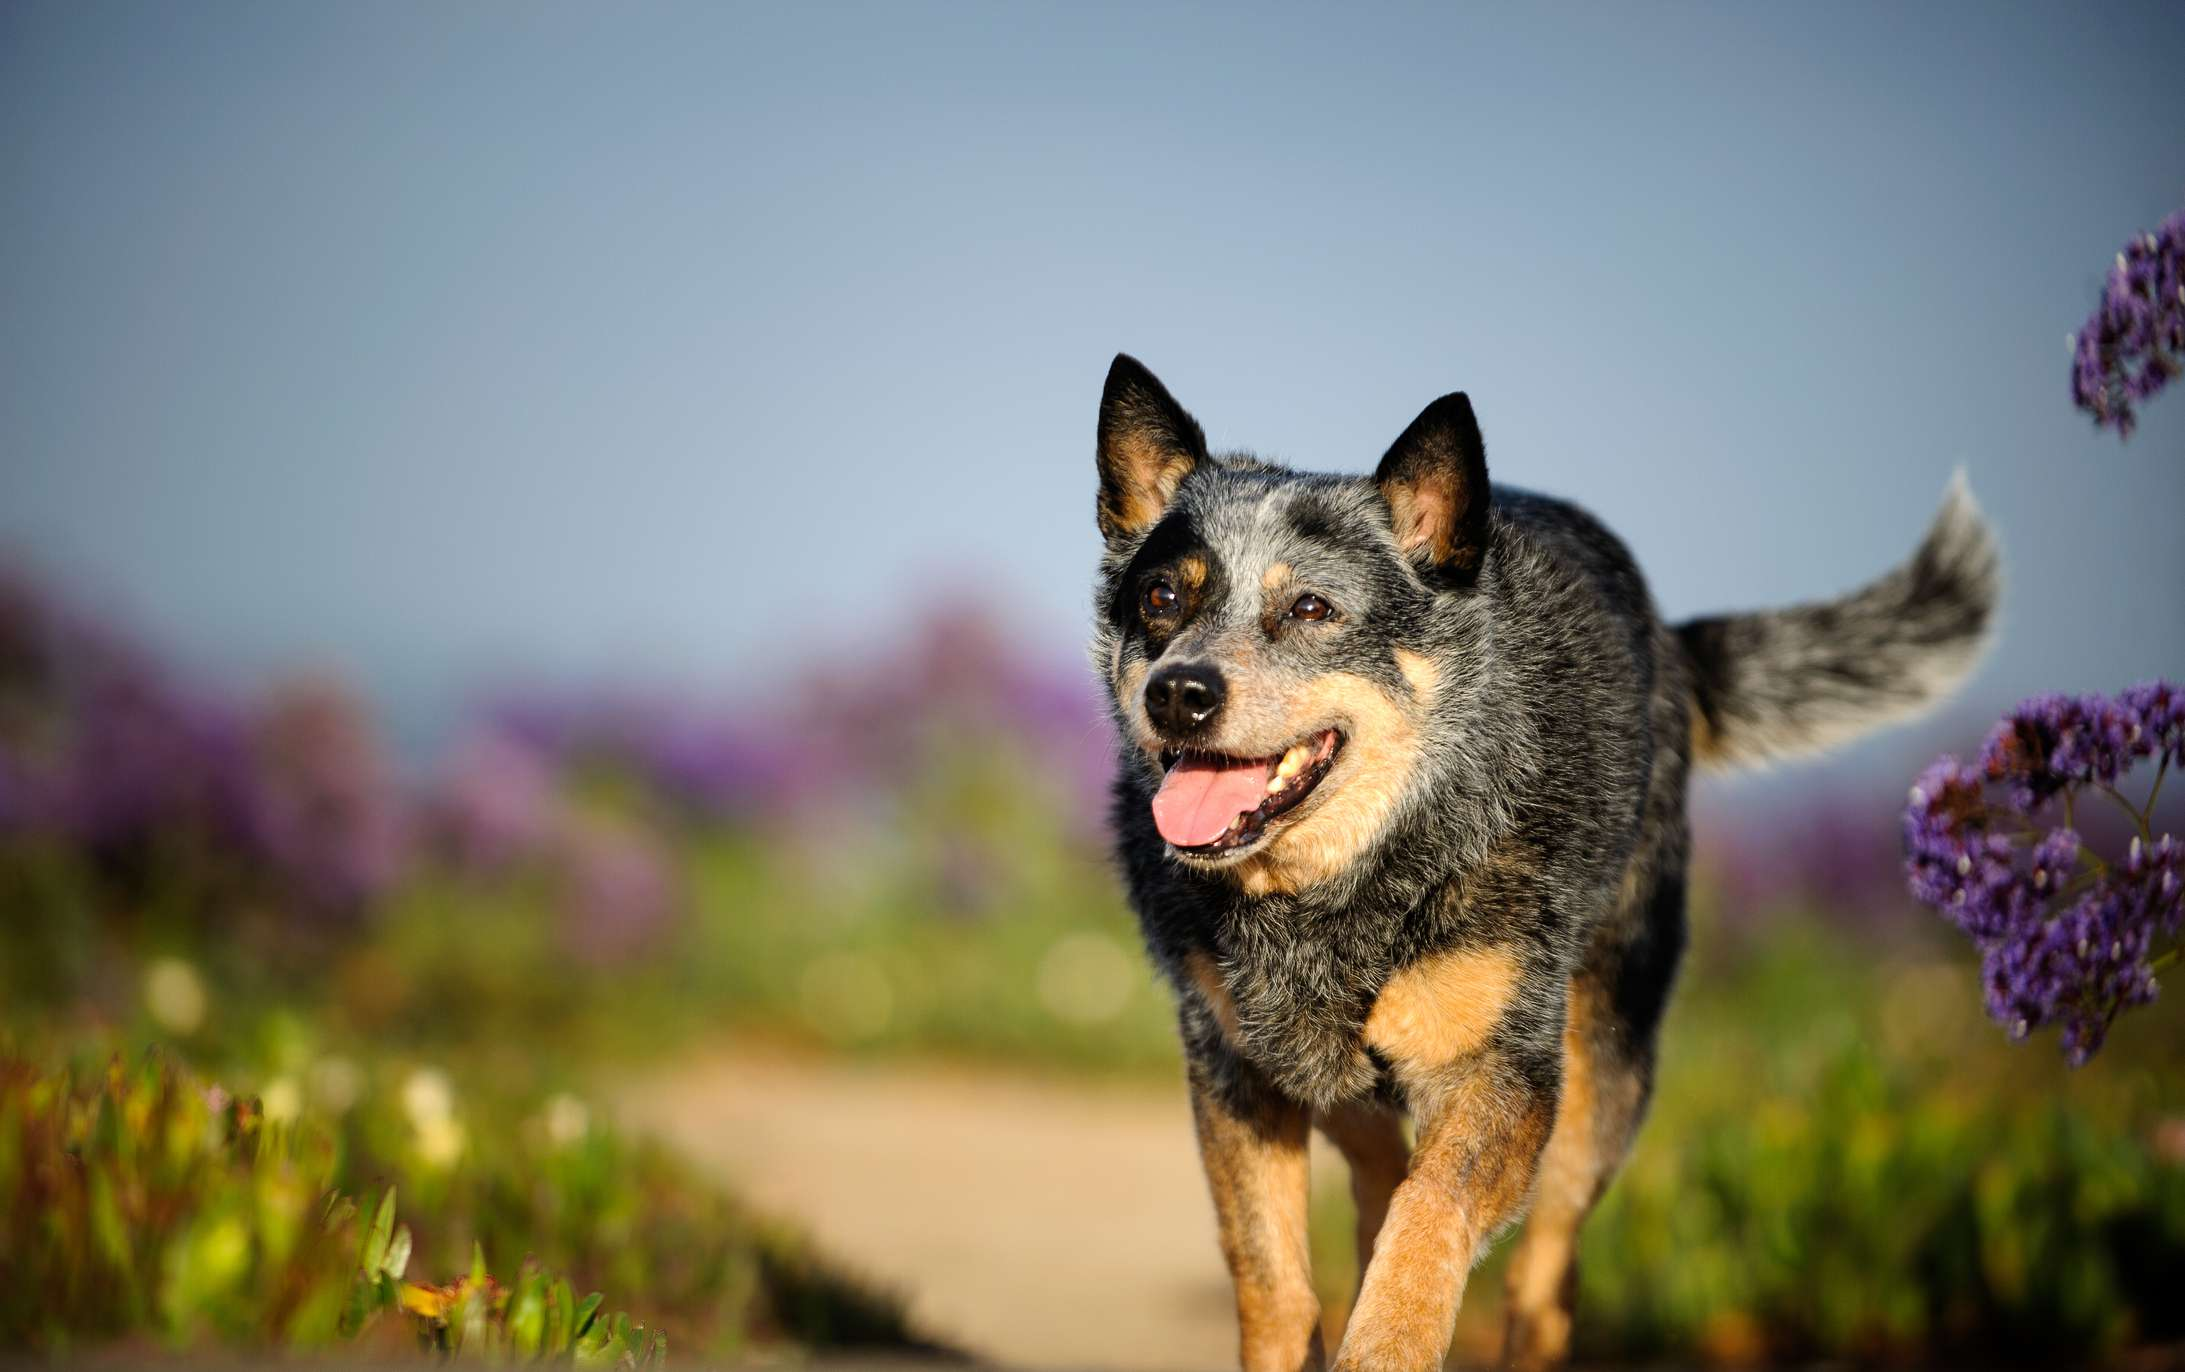 Australian cattle dog blue heeler walking outside; best dog breeds for warm weather